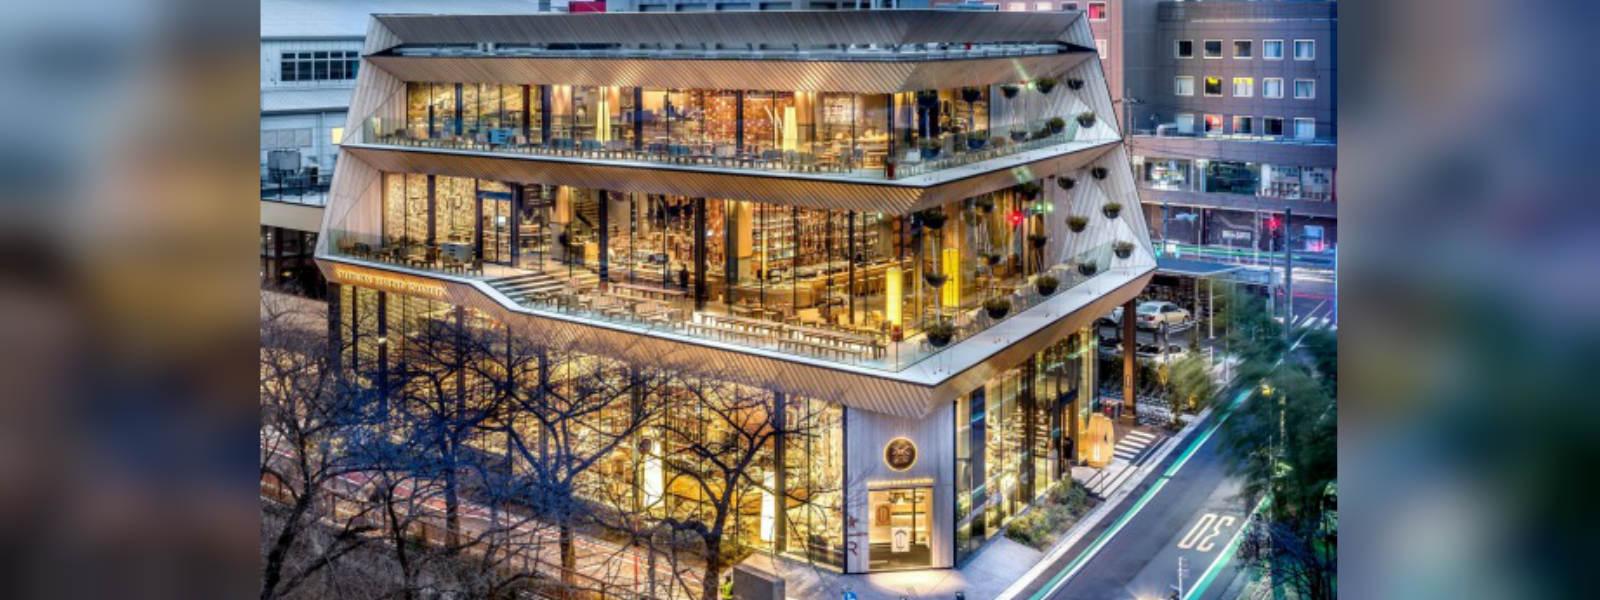 World's largest Starbucks set for Chicago debut